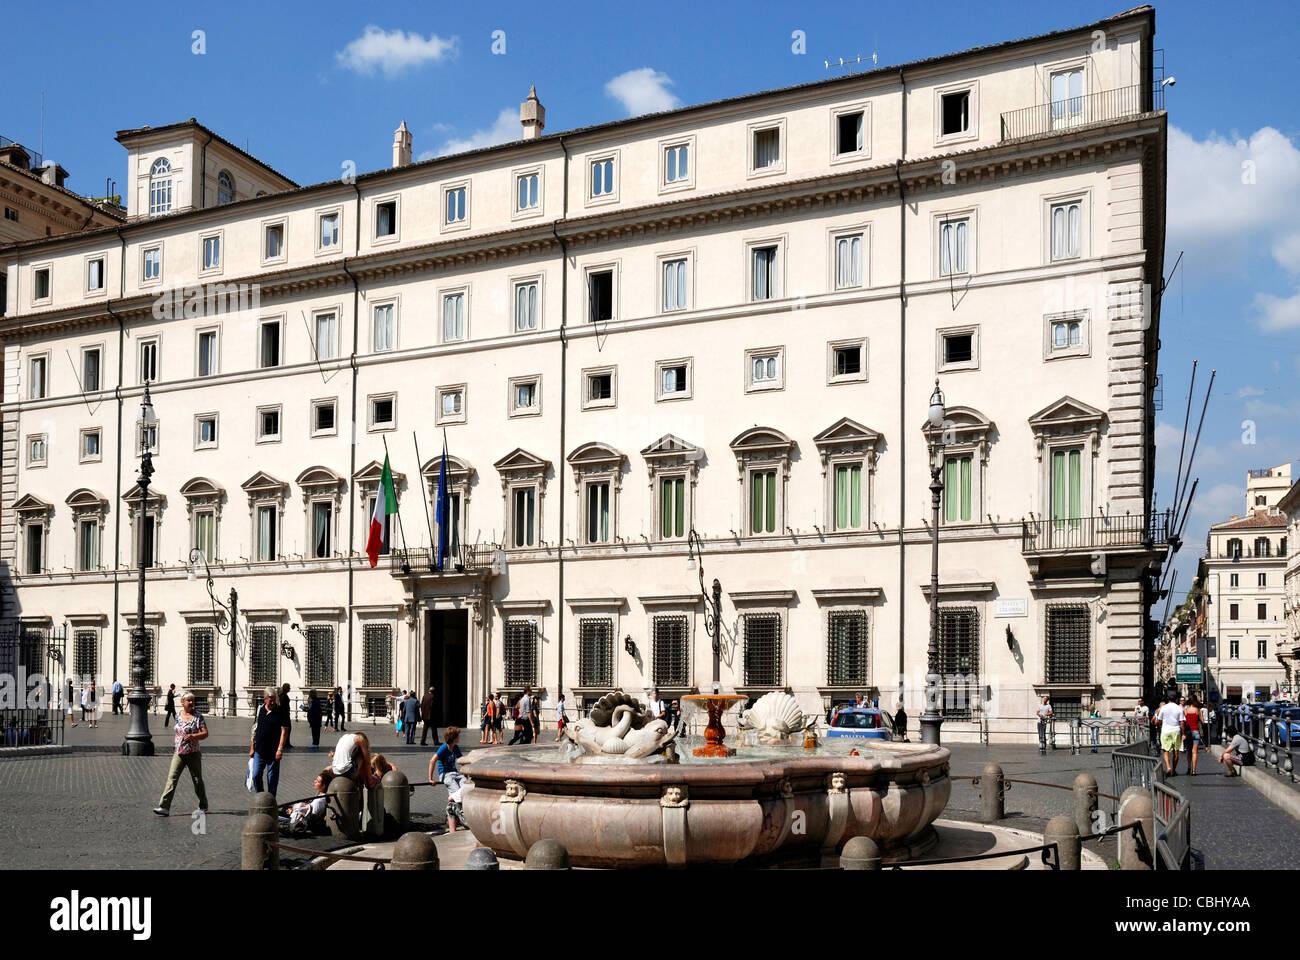 Palazzo Chigi in Rome - Residence of the Italian Prime Minister. - Stock Image